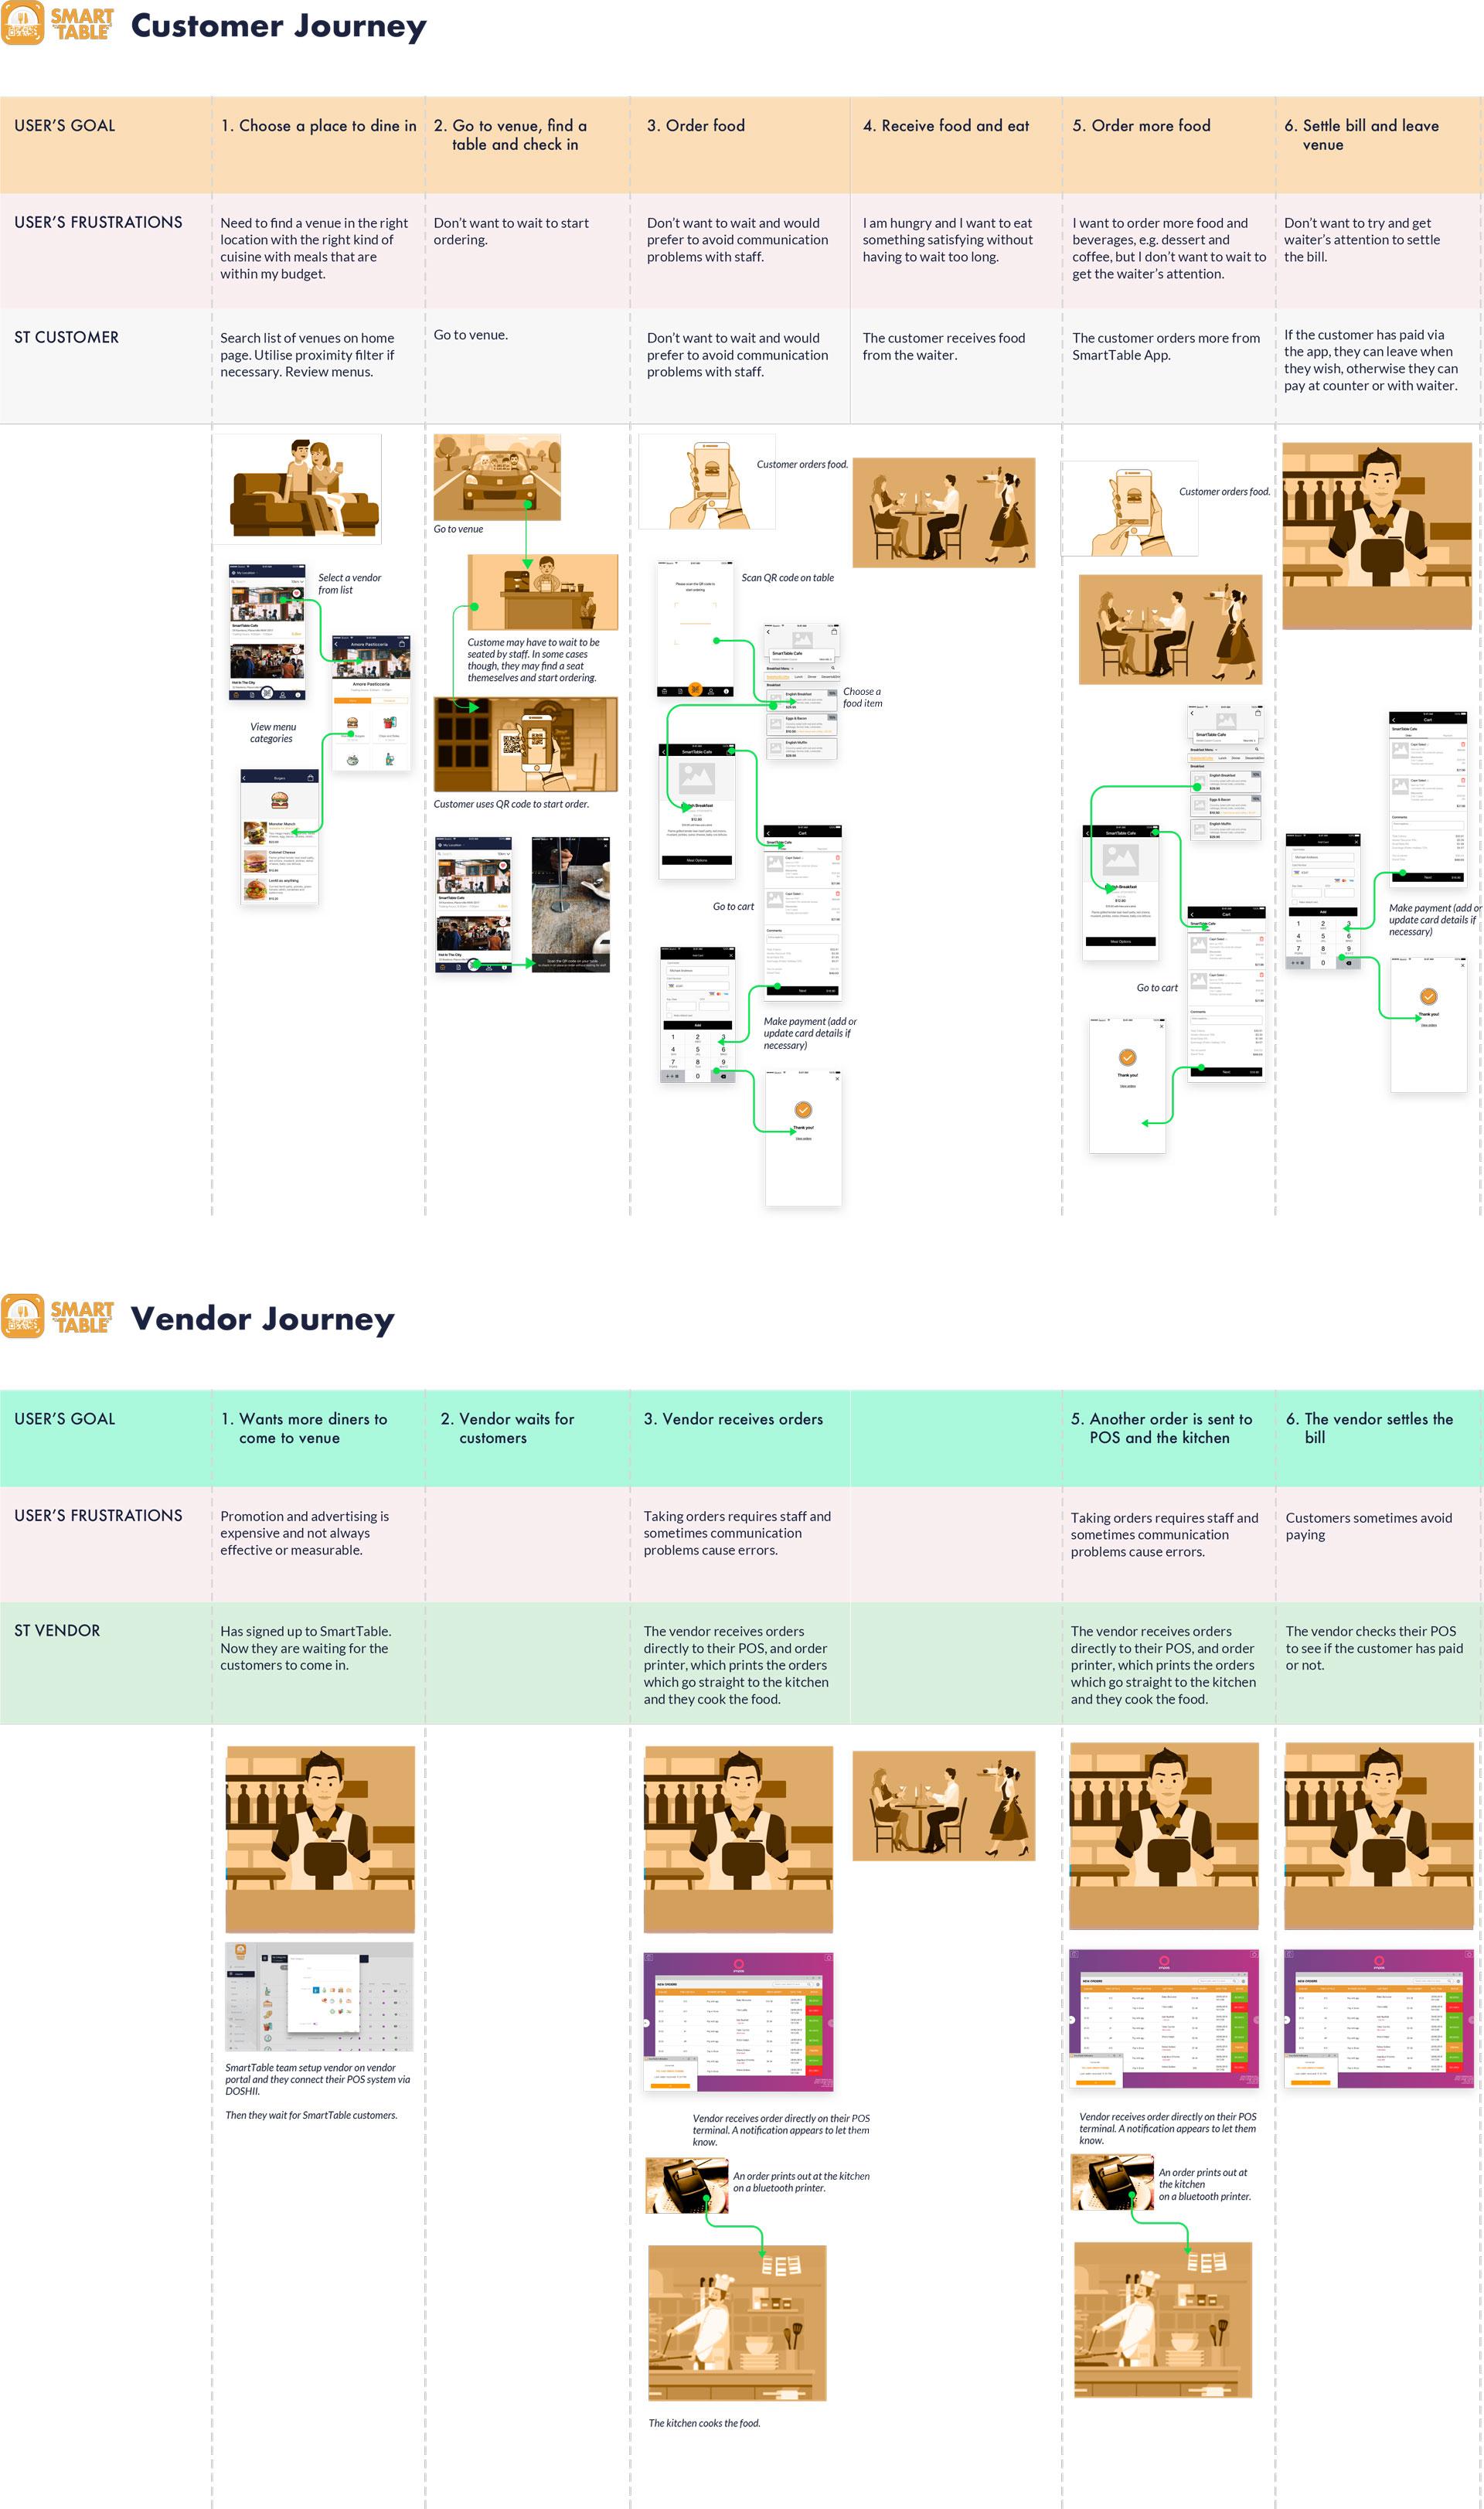 User Journey of Food Ordering App